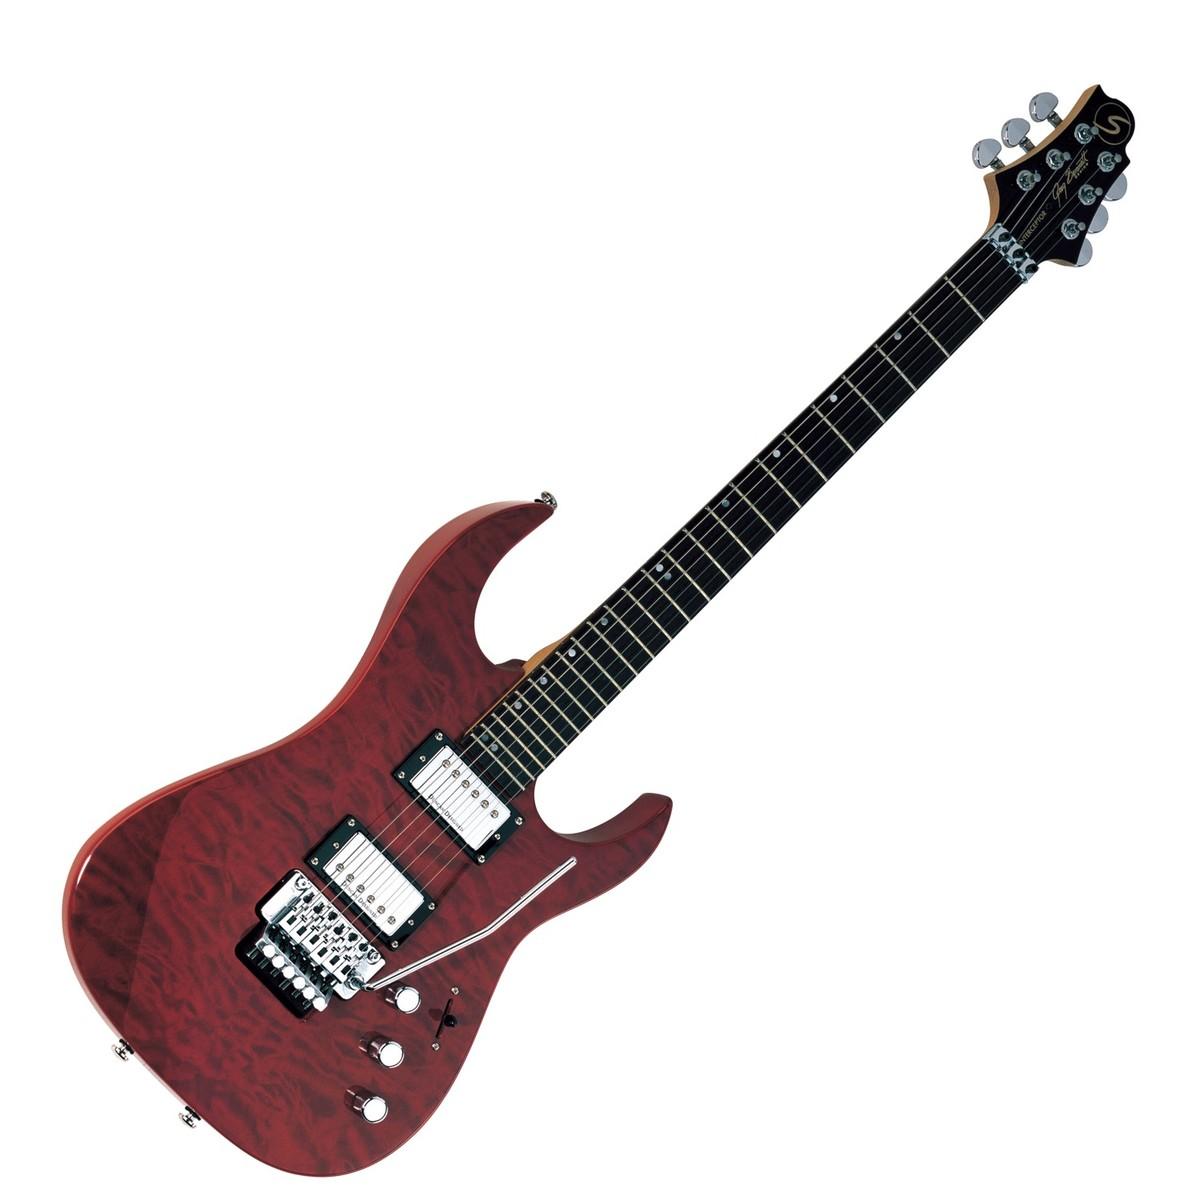 greg bennett interceptor ic 30 electric guitar trans red b stock at gear4music. Black Bedroom Furniture Sets. Home Design Ideas